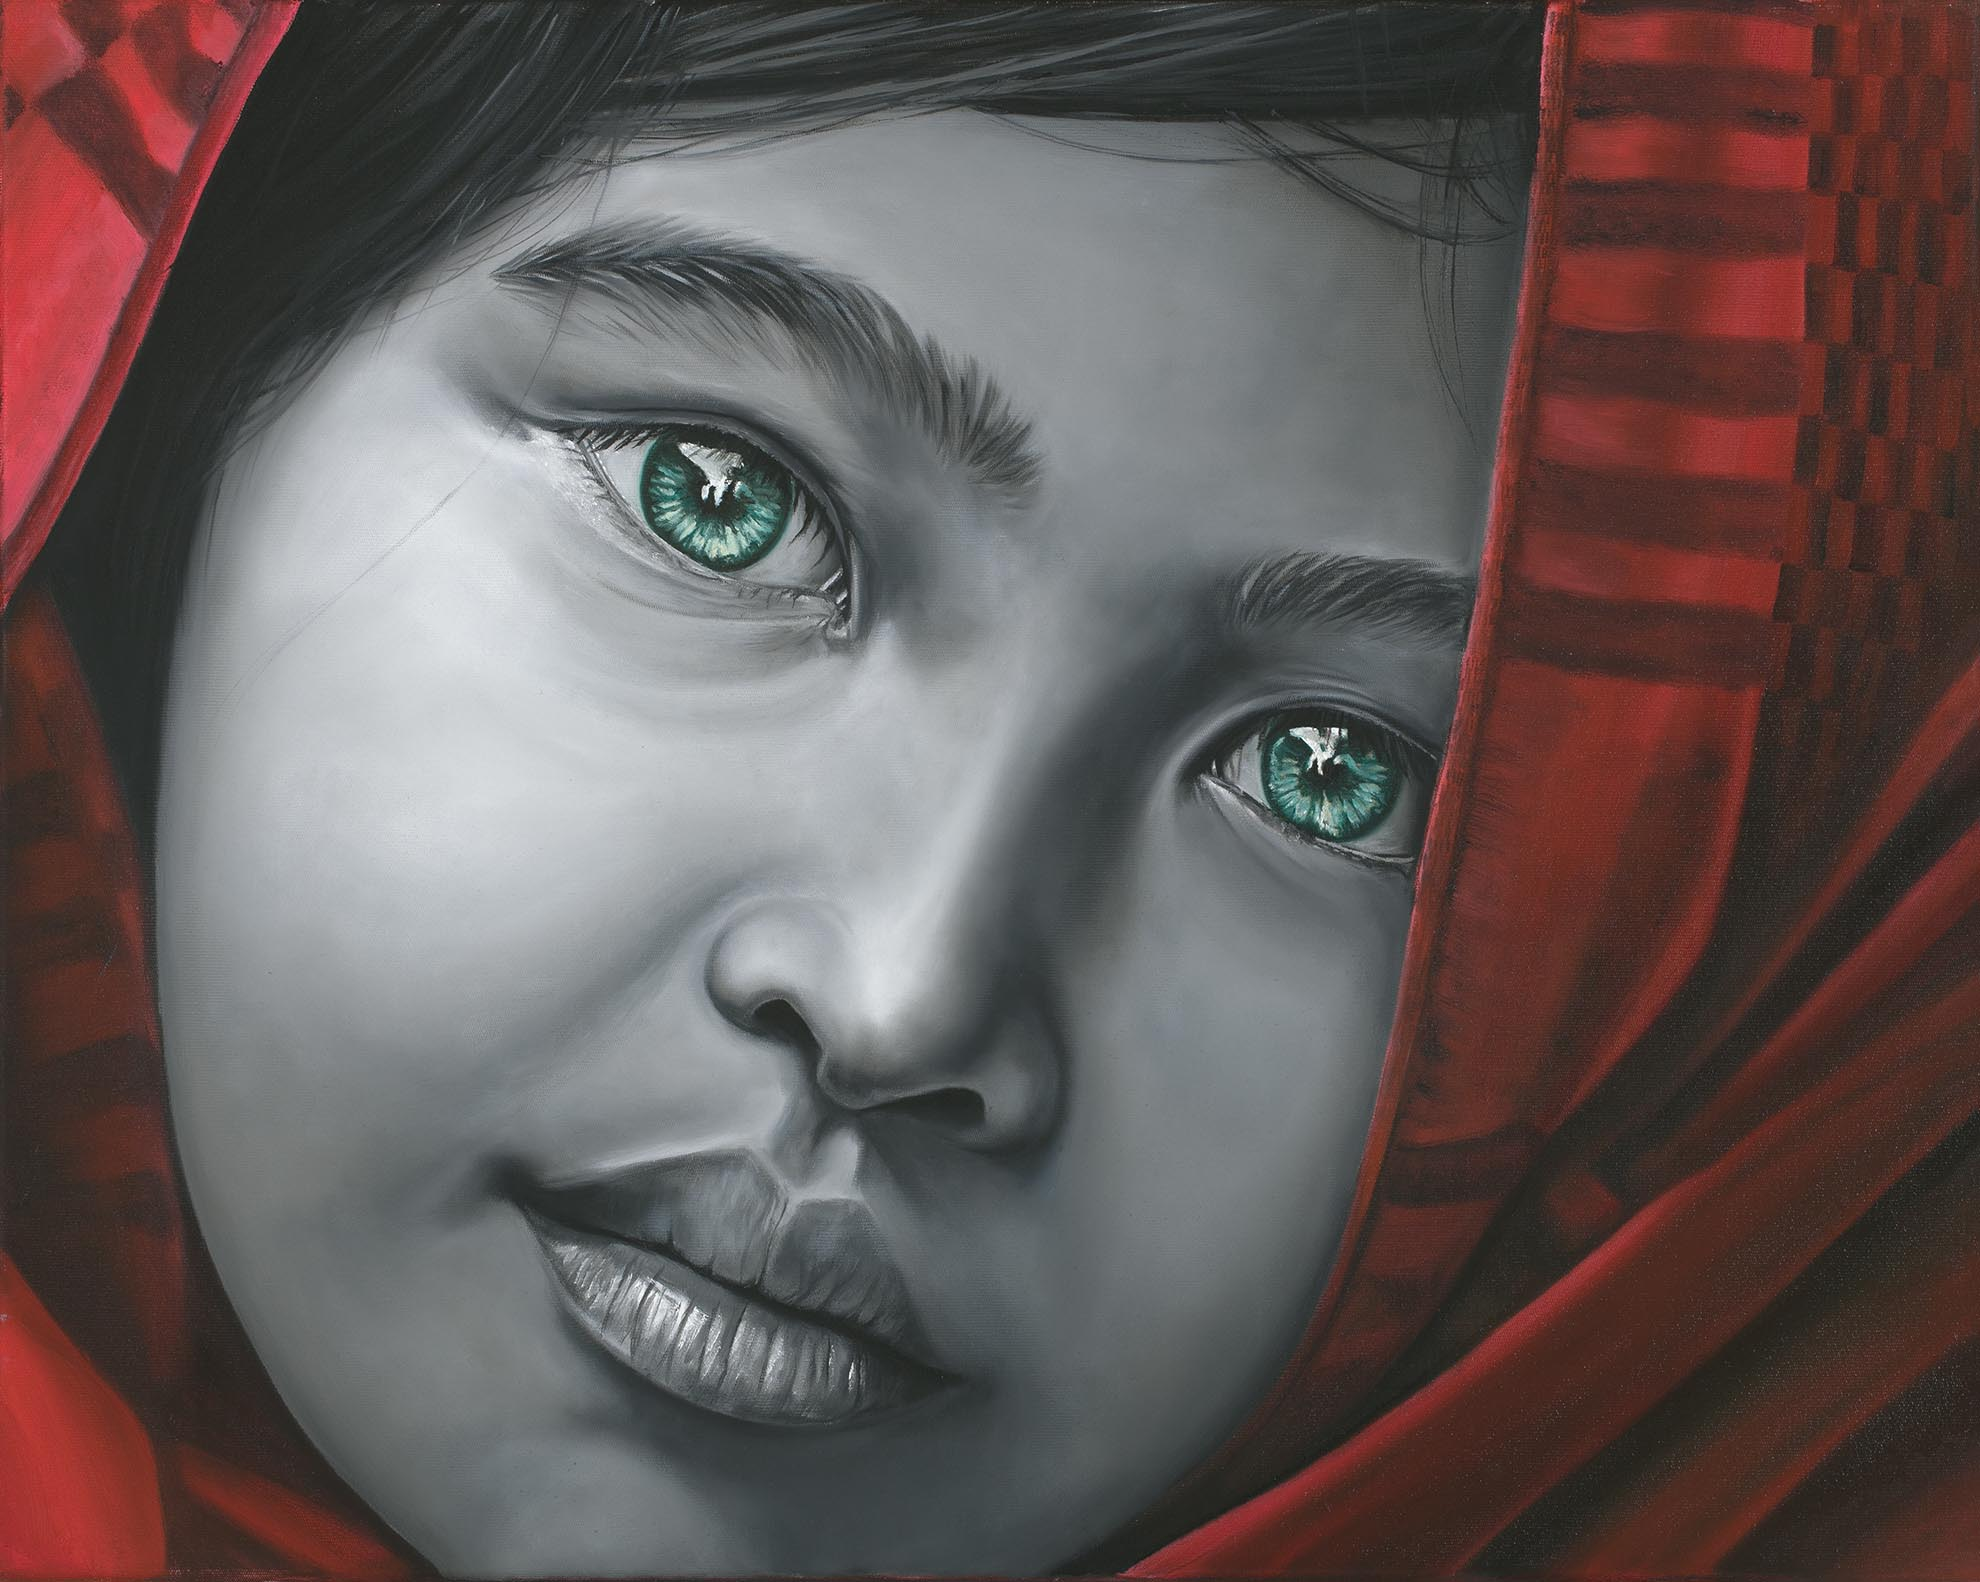 Yuva, 2018, Oil on Canvas, 16 x 20 inches, $832